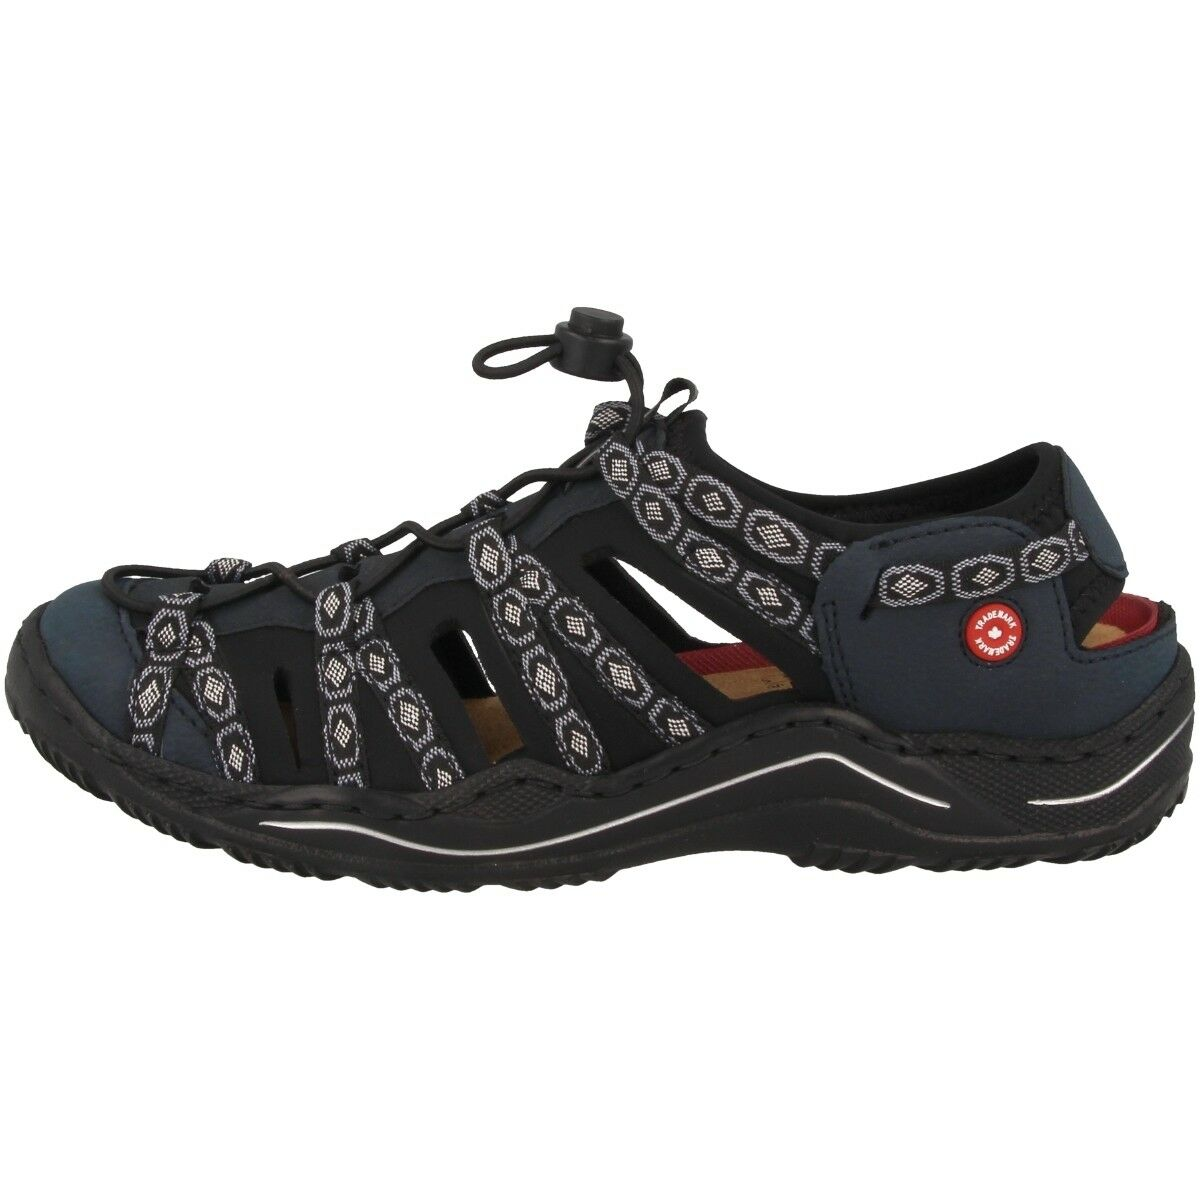 Rieker Outdoor bukina-namur scarpe donna ANTI-STRESS Outdoor Rieker SNEAKERS SANDALI l0577-15 e3f50a